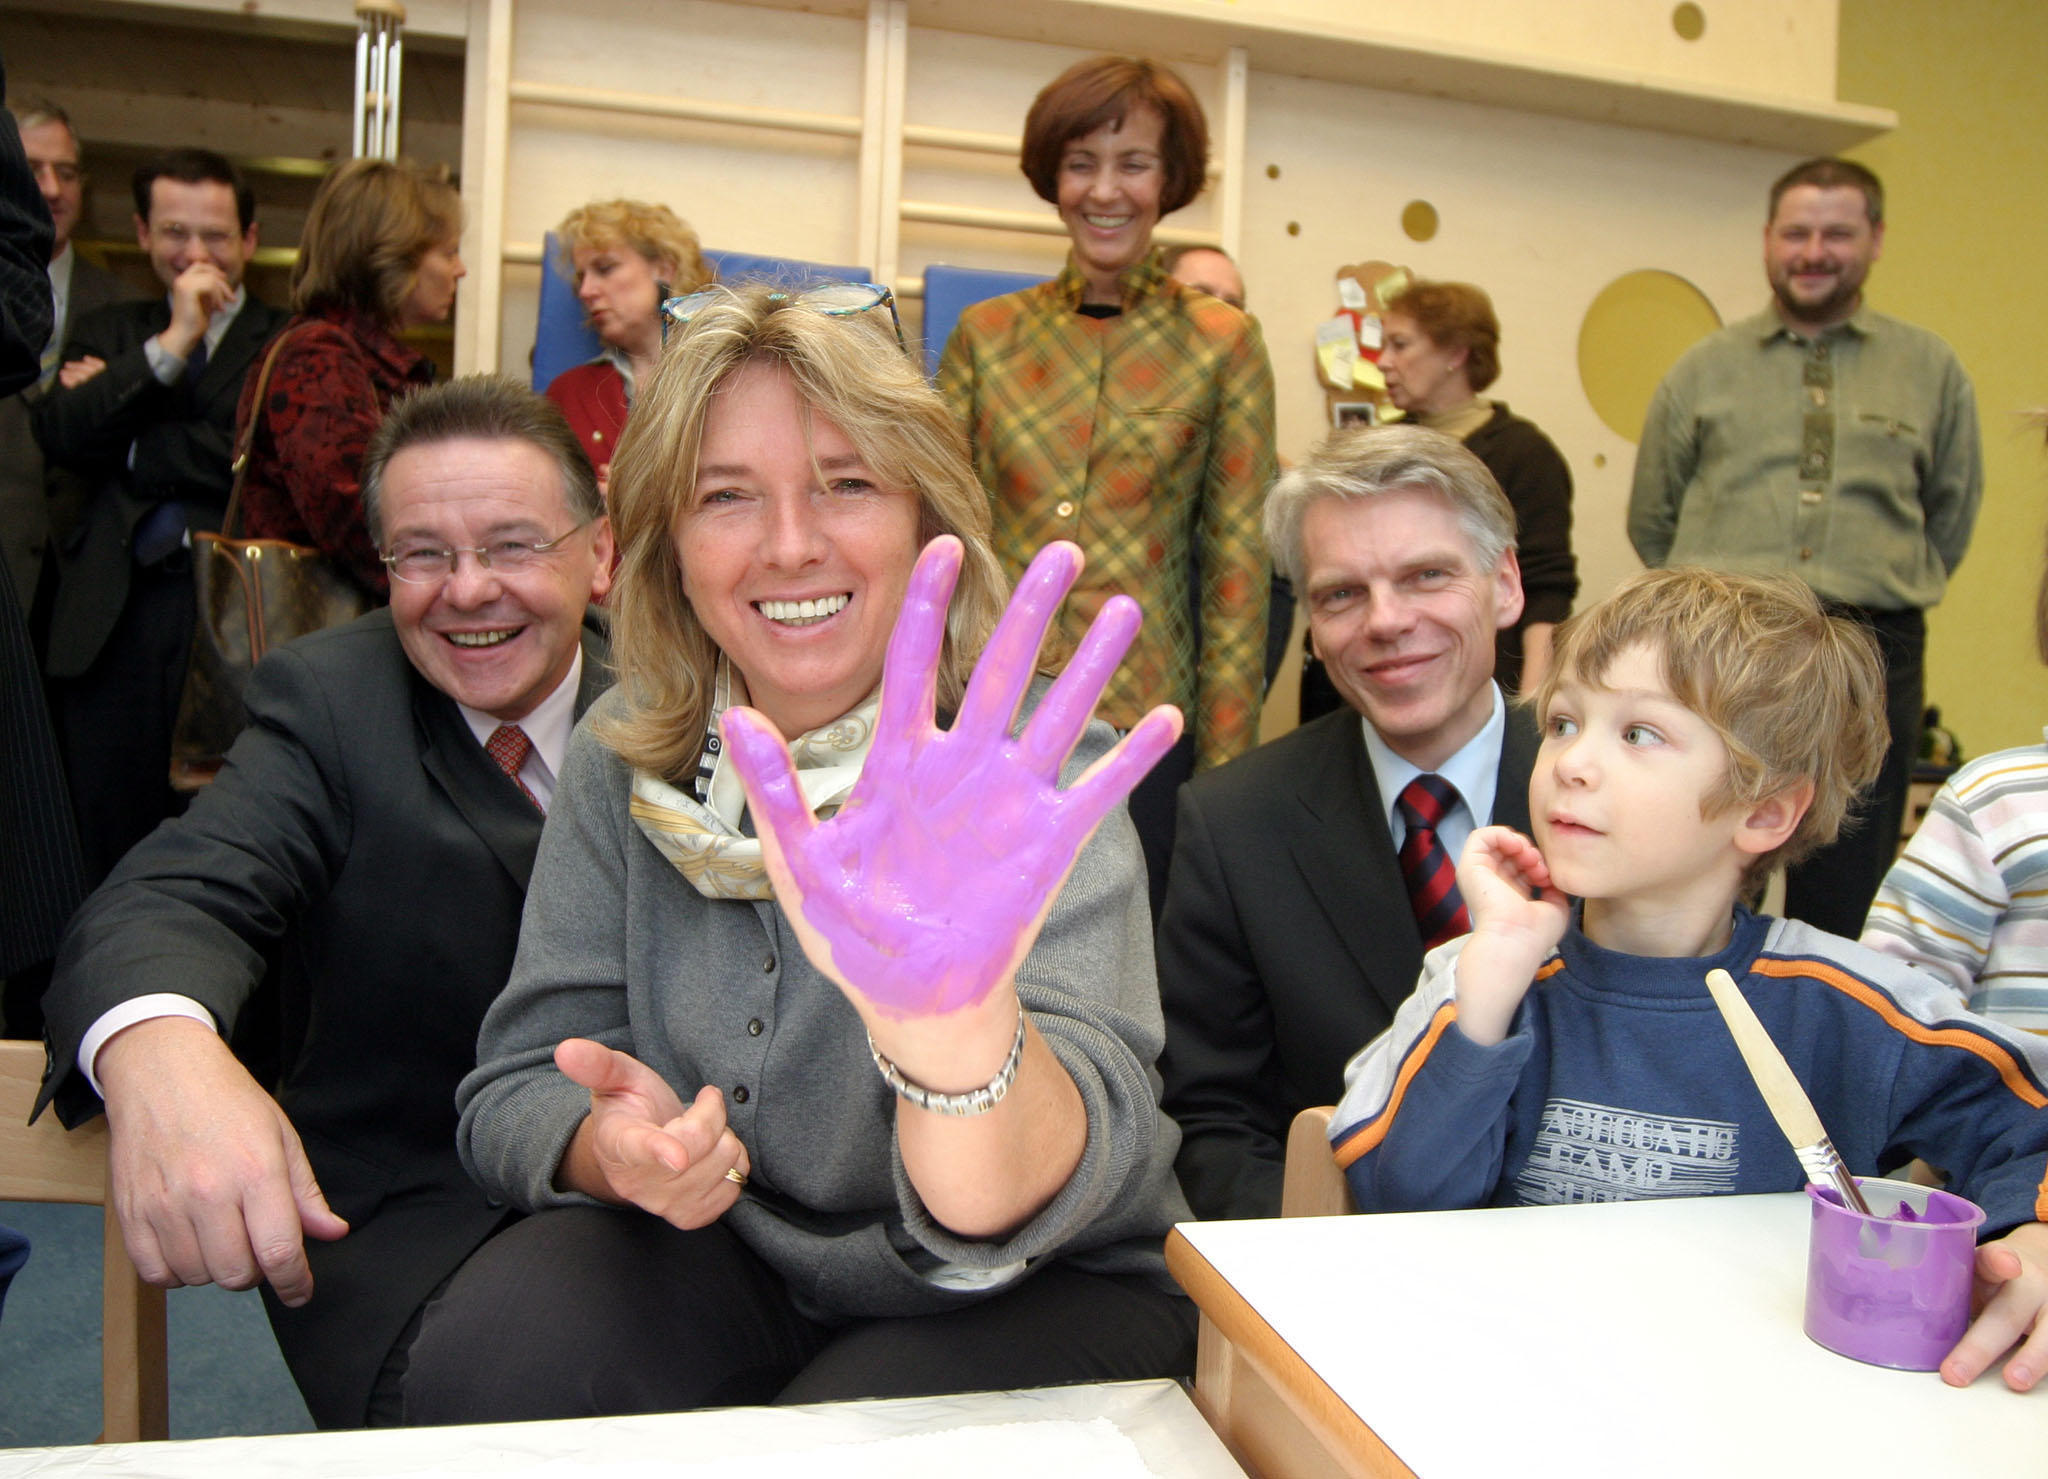 Vizebürgermeisterin Grete Laska, Klaus Stochl (links), DDr. Andreas Barner (rechts) und Kind